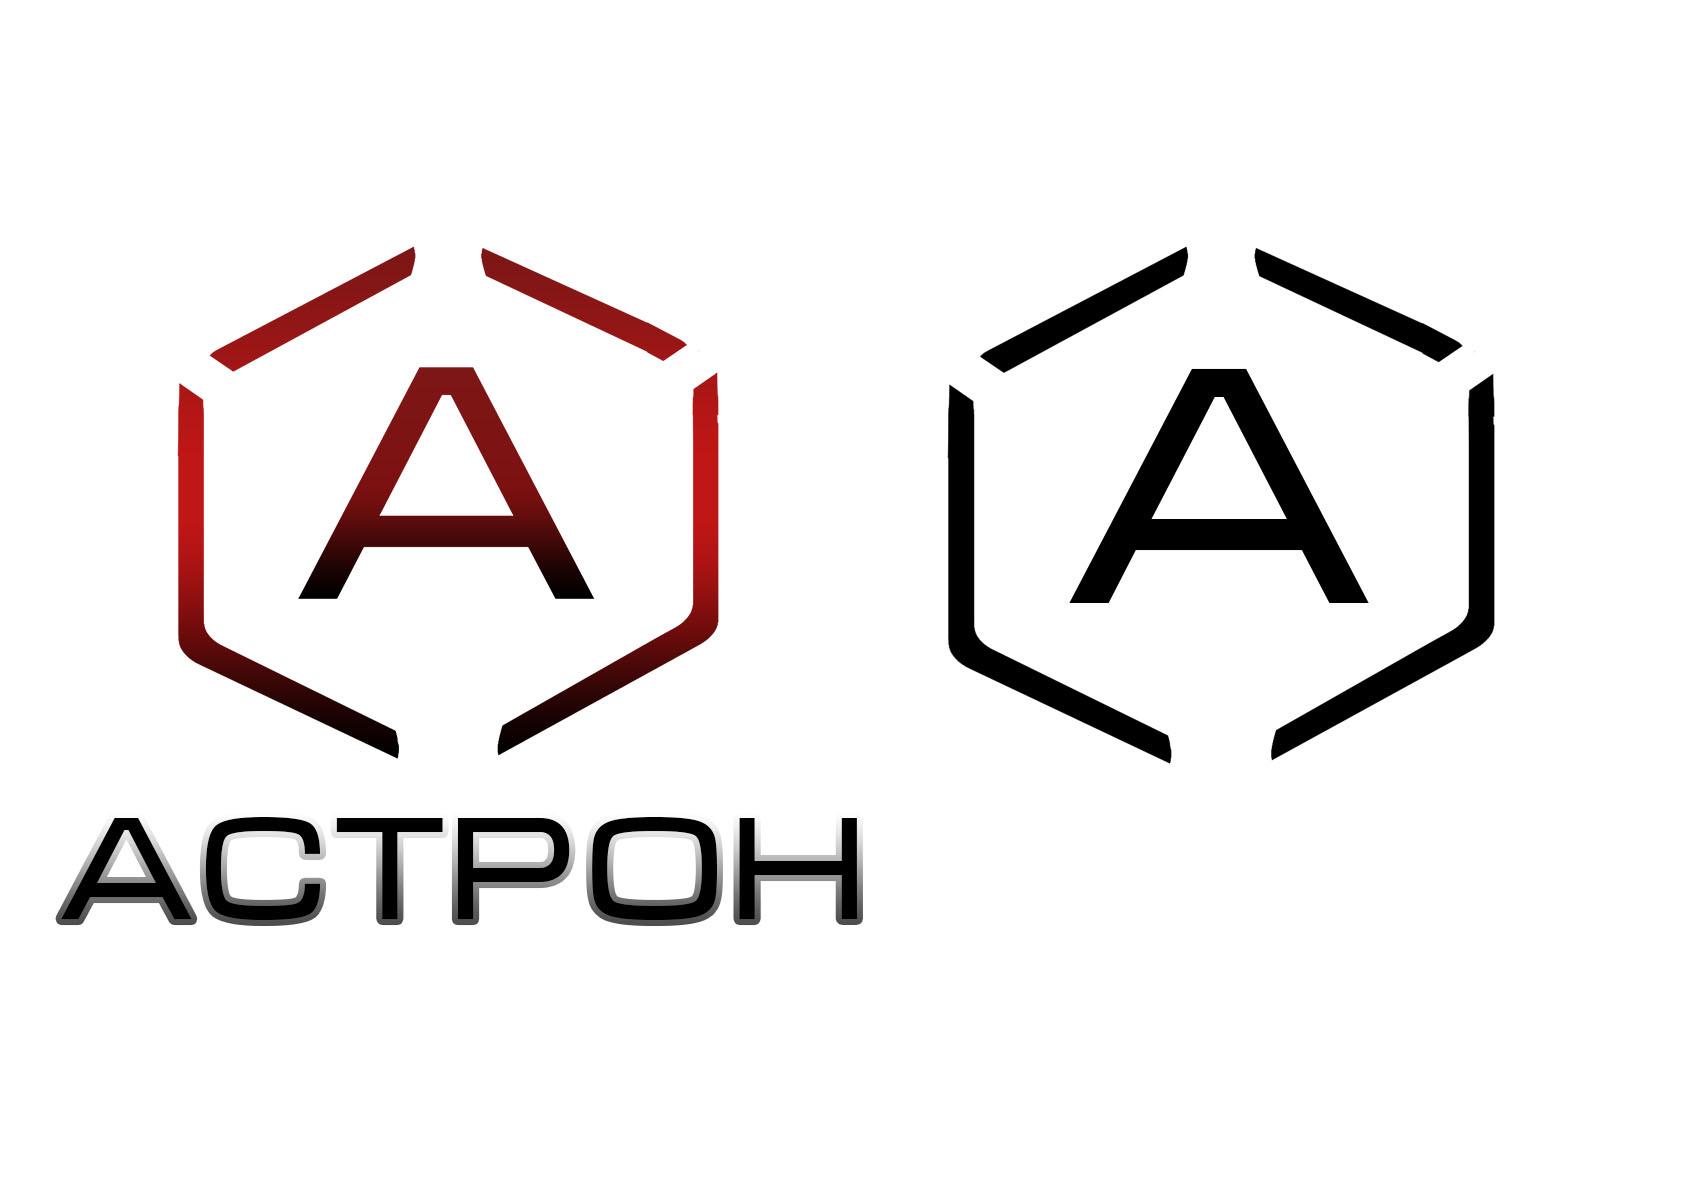 Товарный знак оптоэлектронного предприятия фото f_15153fb412fe29ec.jpg